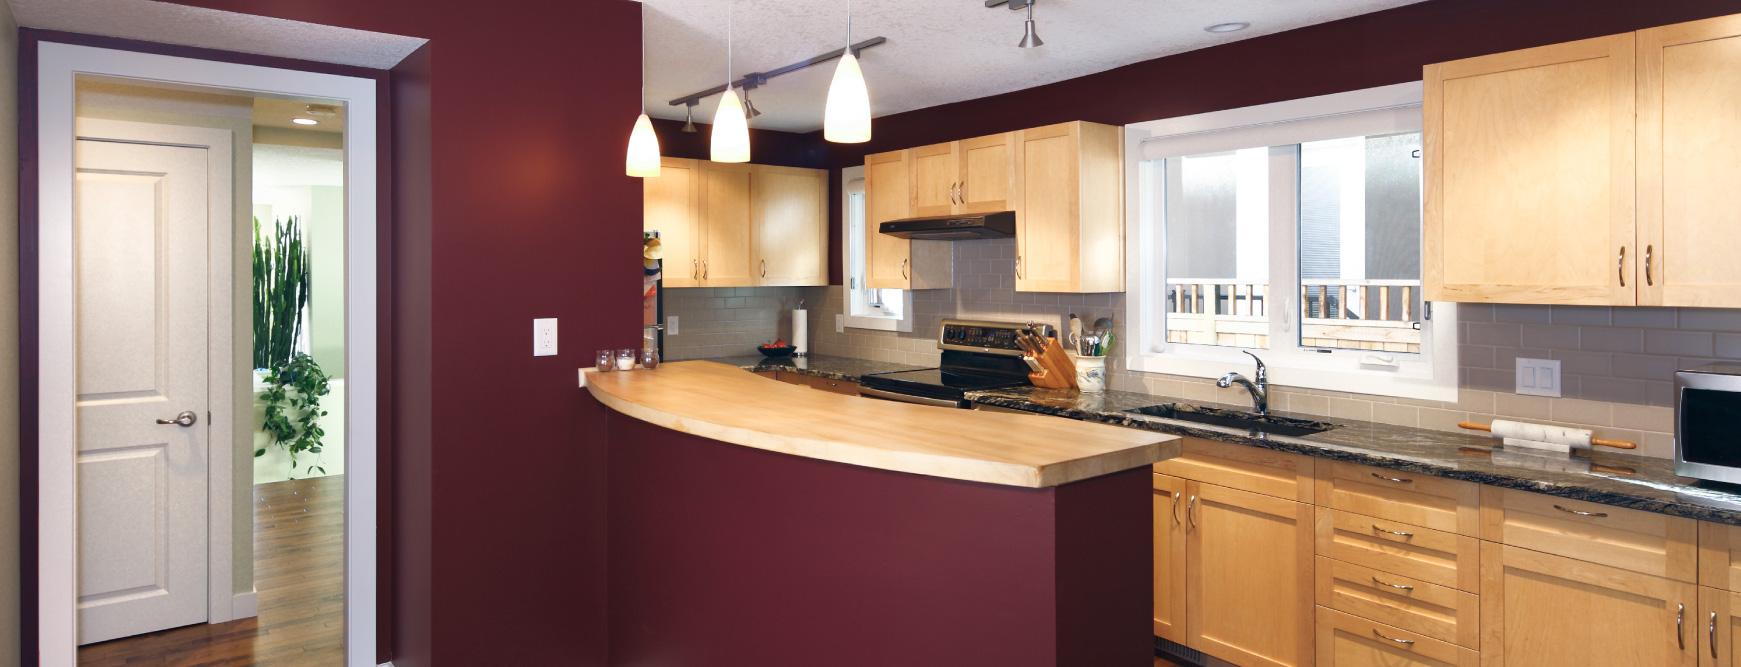 Kitchen Renovation in Hillhurst, Calgary